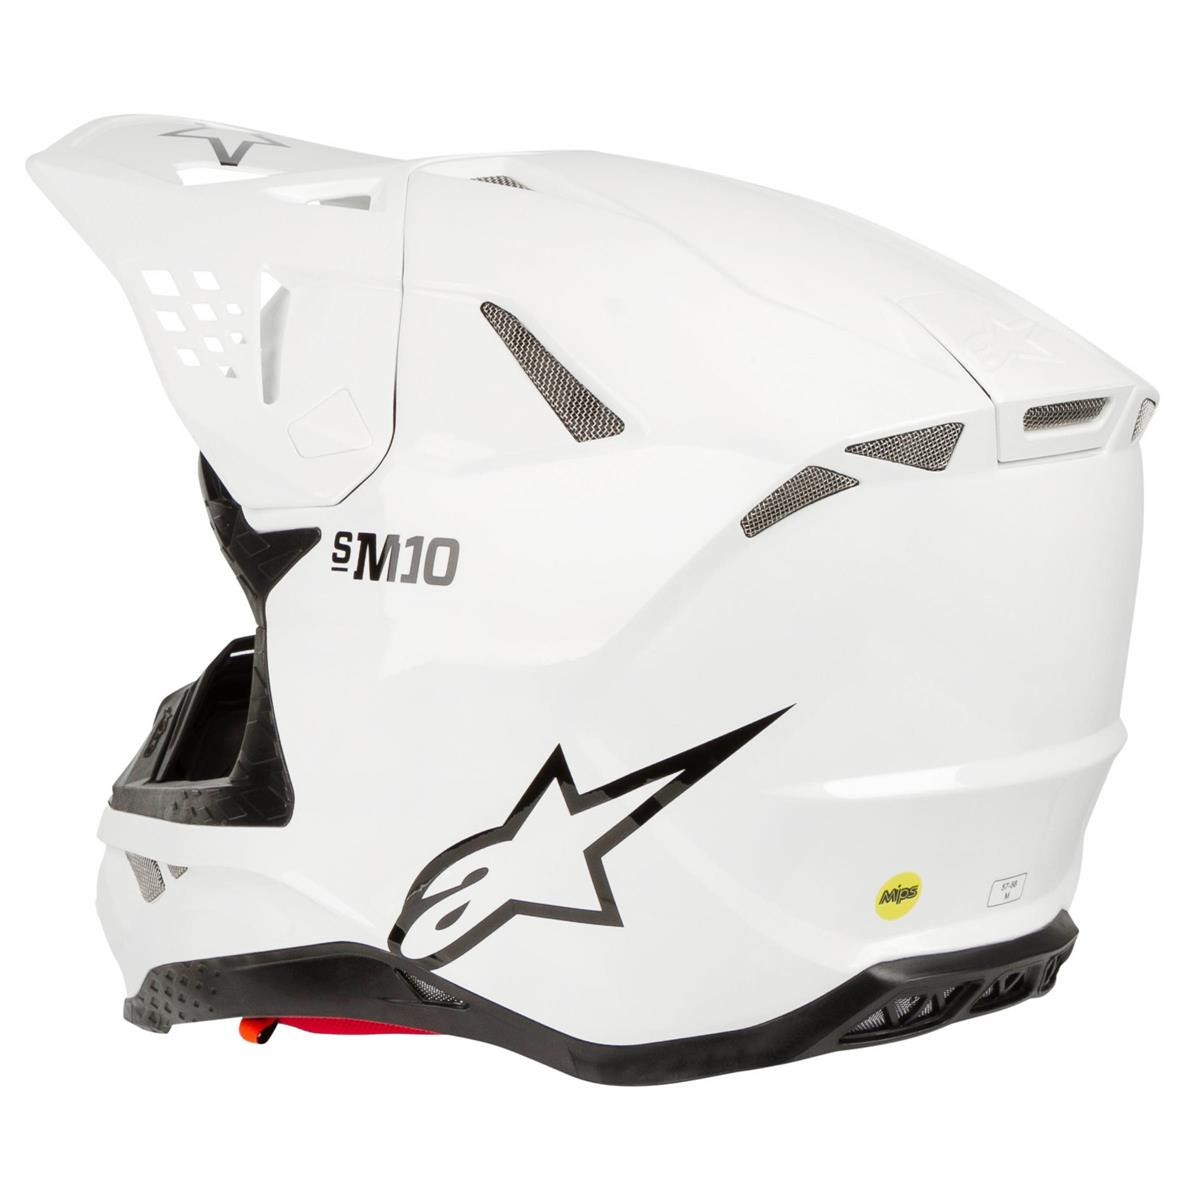 alpinestars-helm-helmet-supertech-s-m10-5 (3)